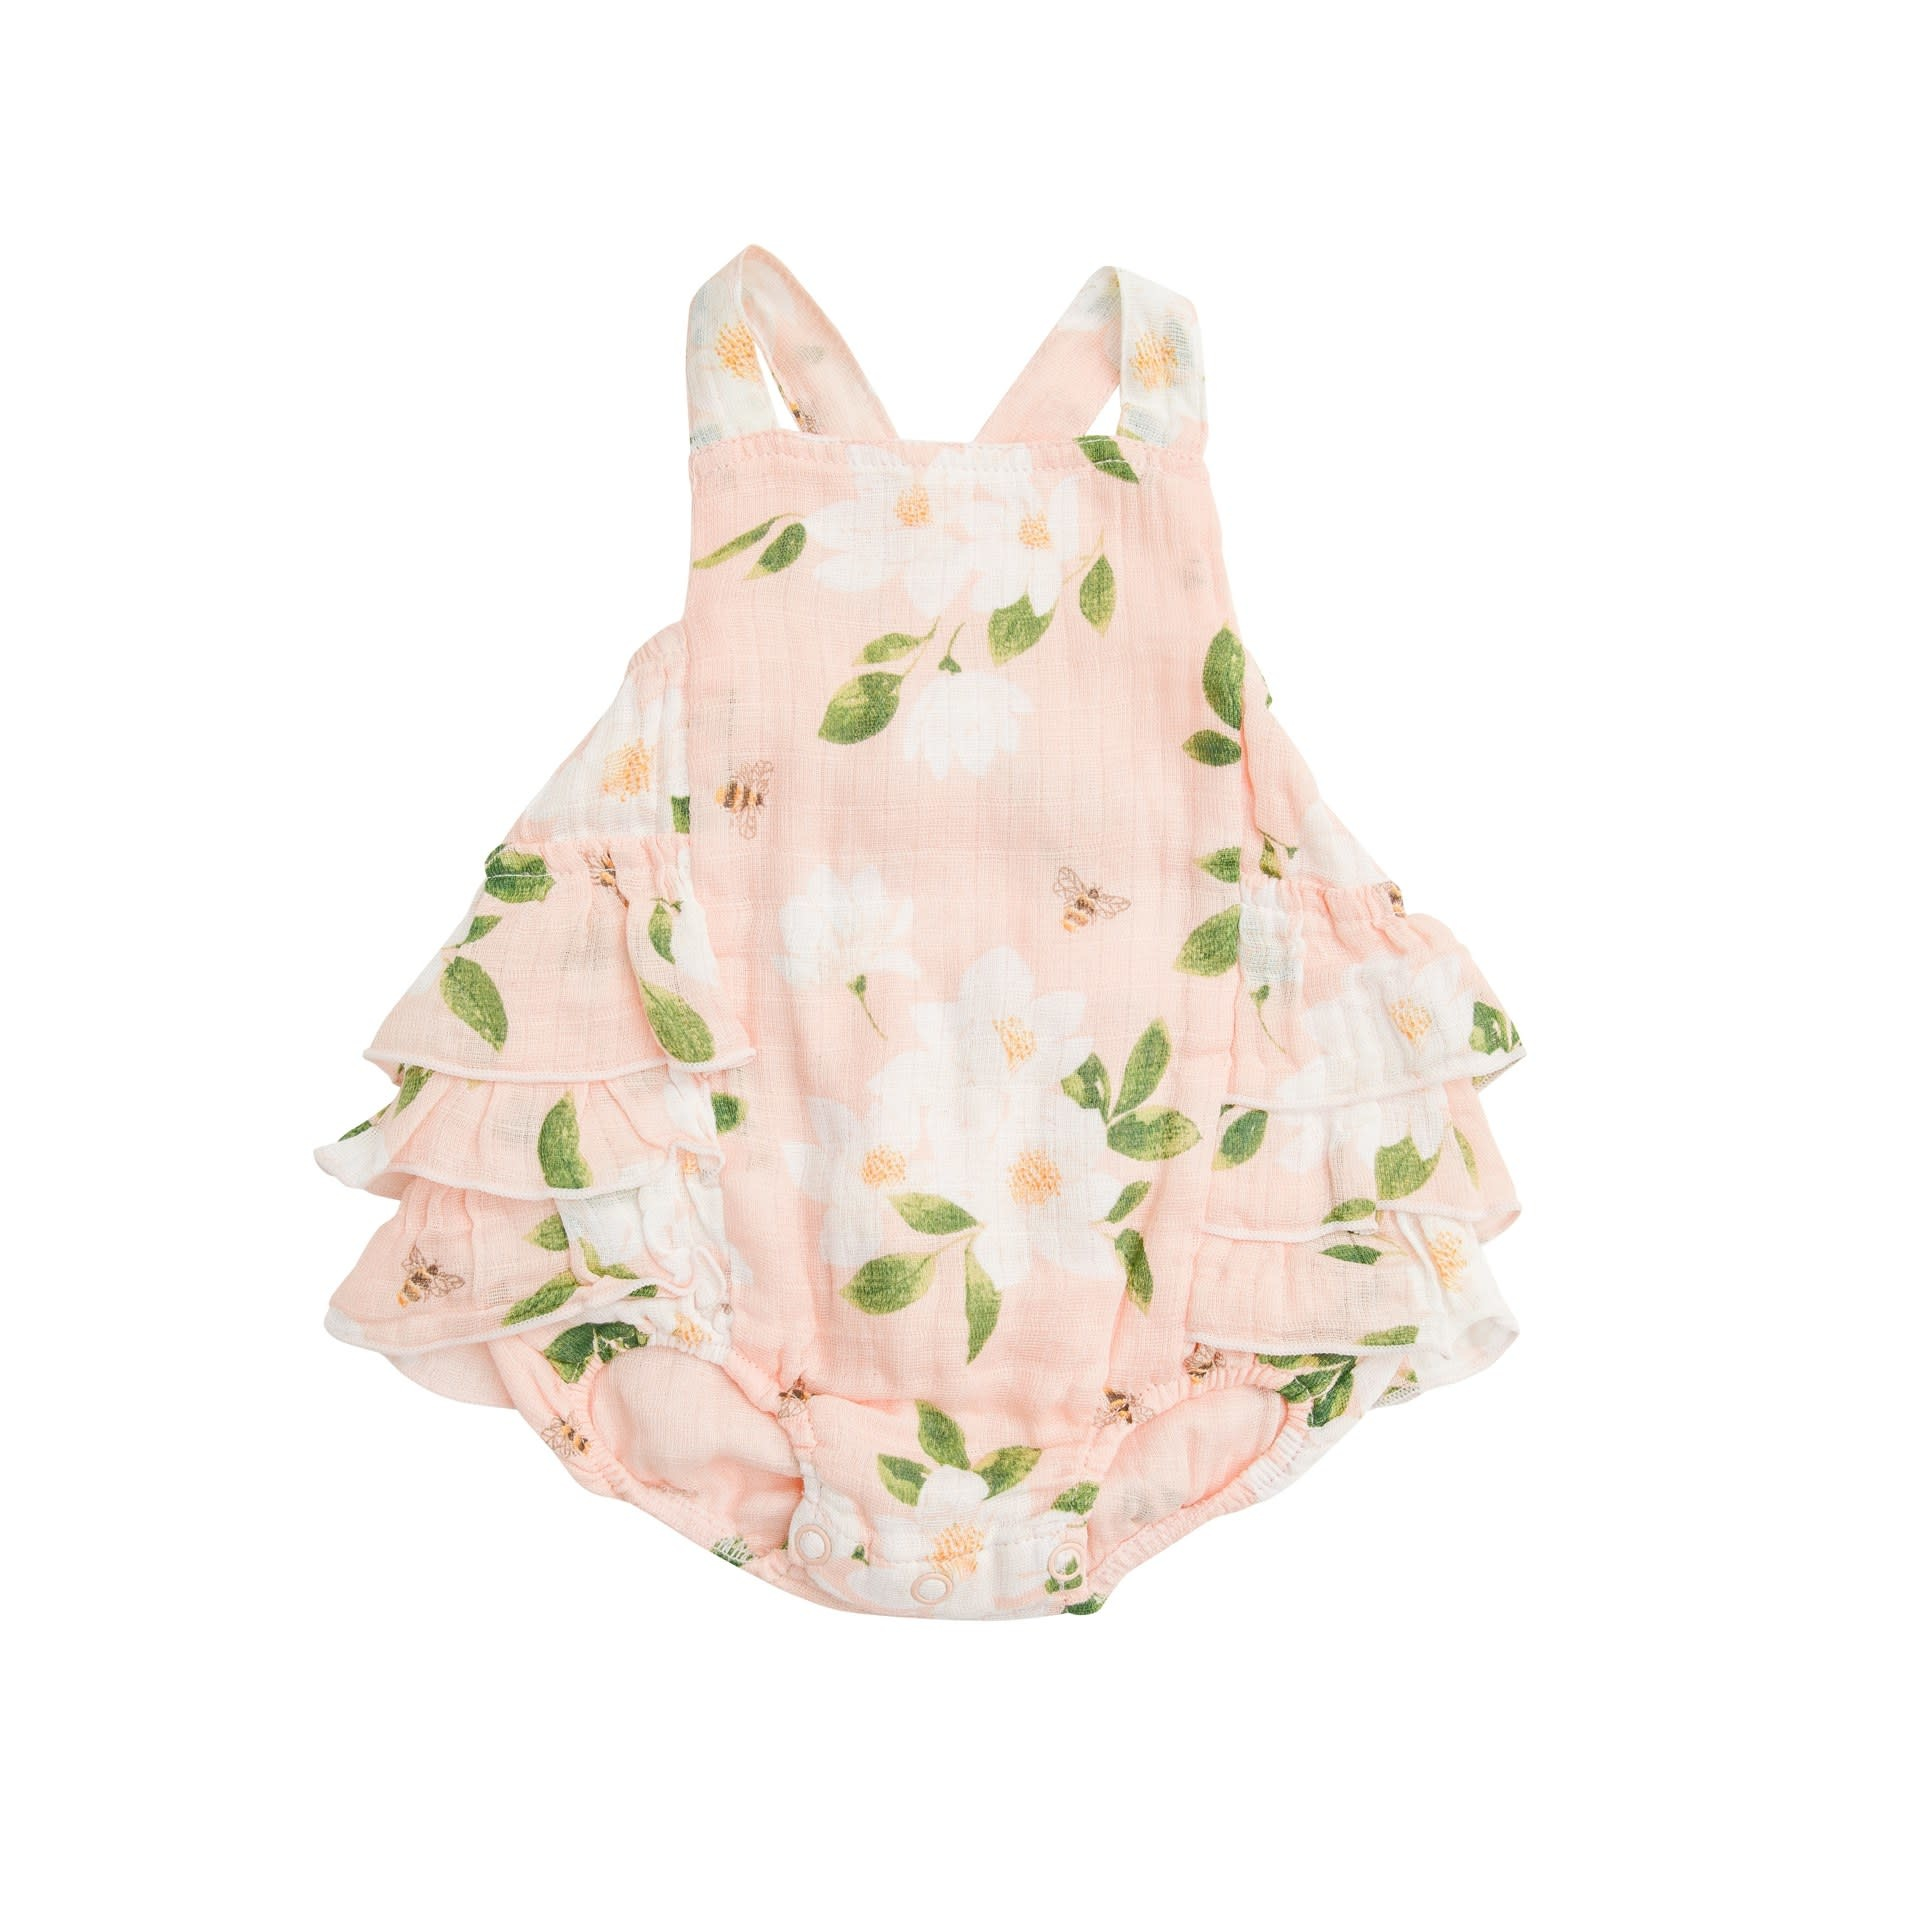 Angel Dear Magnolia Muslin Ruffle Sunsuit Pink